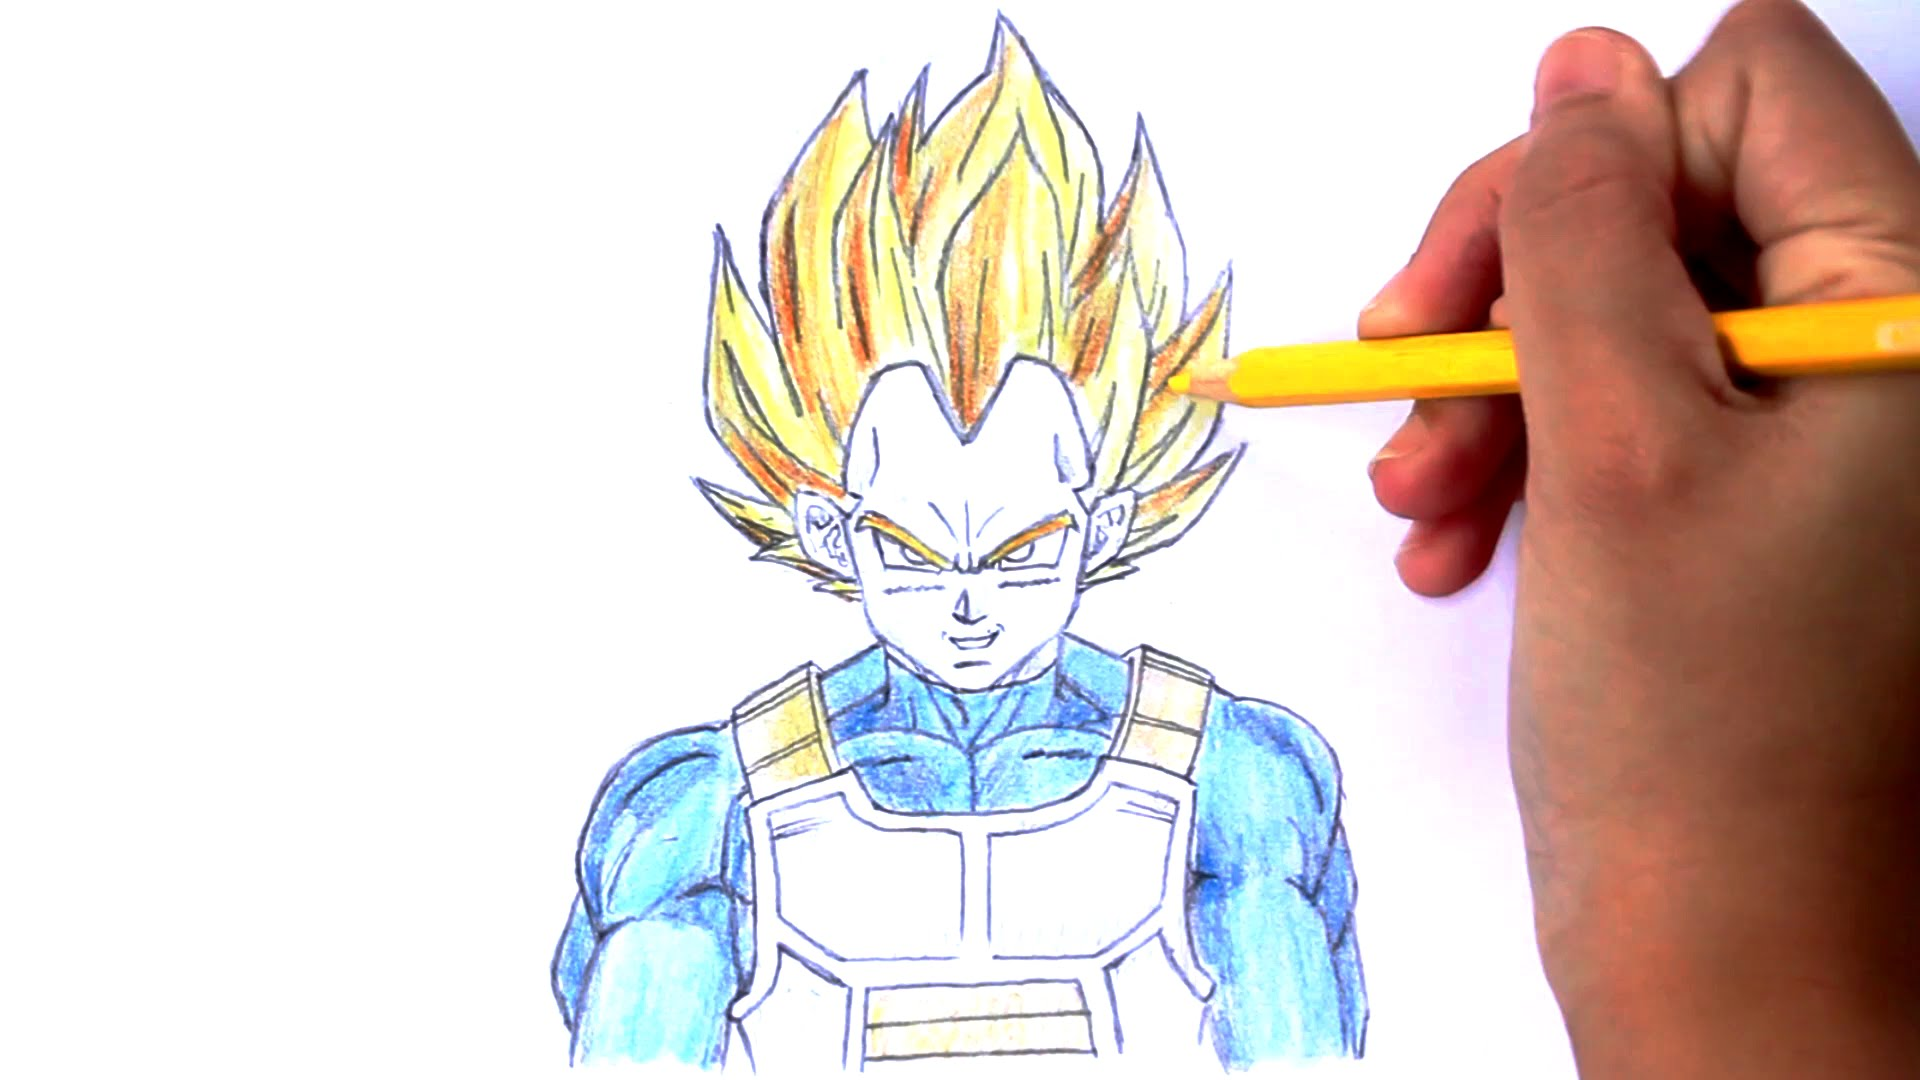 1920x1080 How To Draw Vegeta From Dragon Ball Z